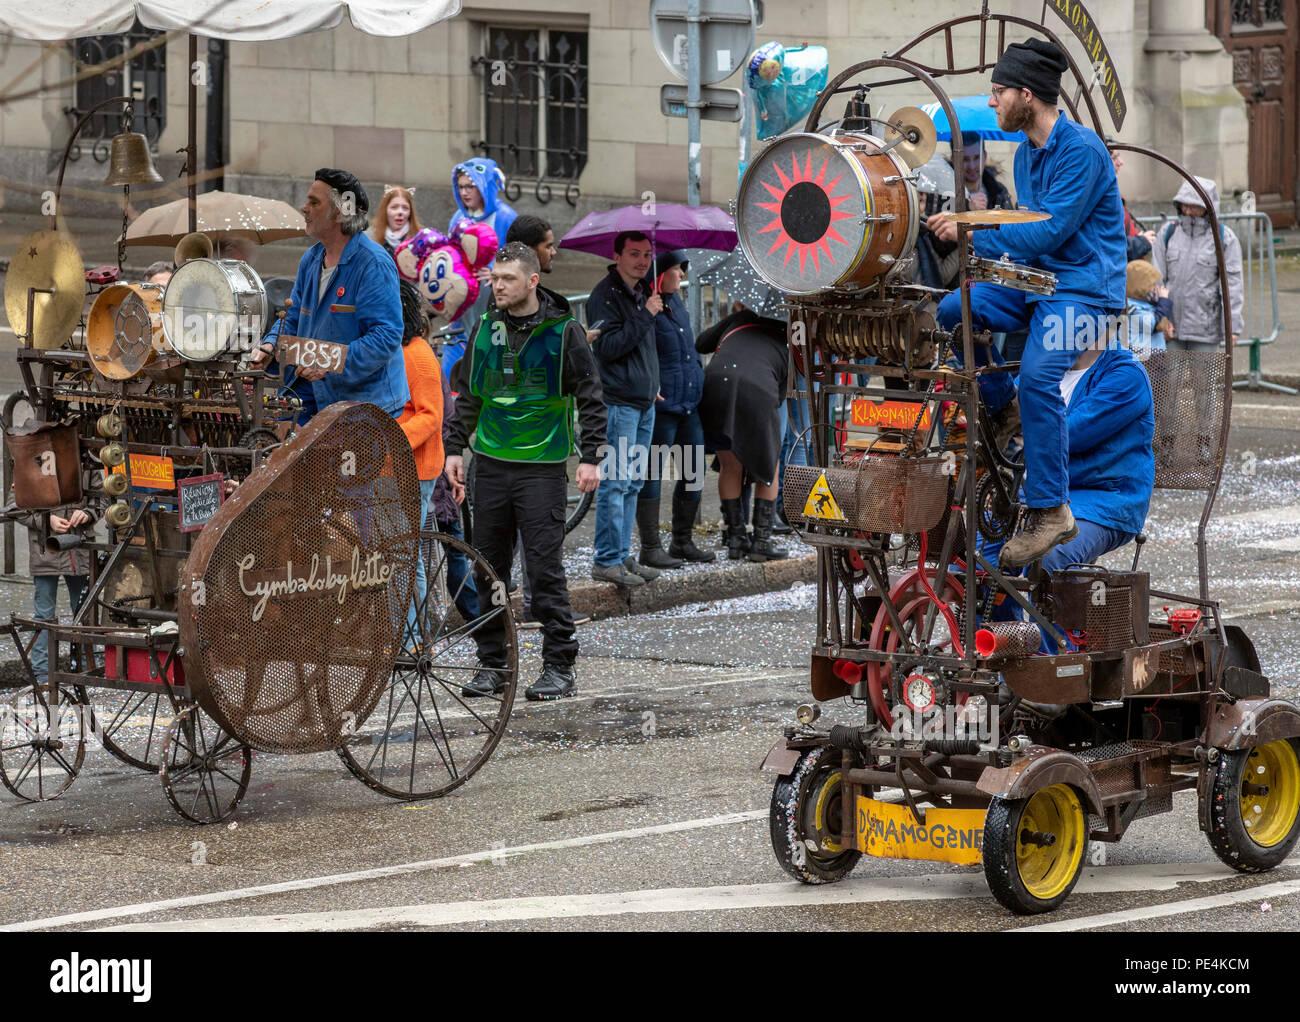 1859 Cymbalobylette, 1952 Klaxonarion dynamogenic mobile, machines musicales, défilé de carnaval de Strasbourg, Alsace, France, Europe, Photo Stock